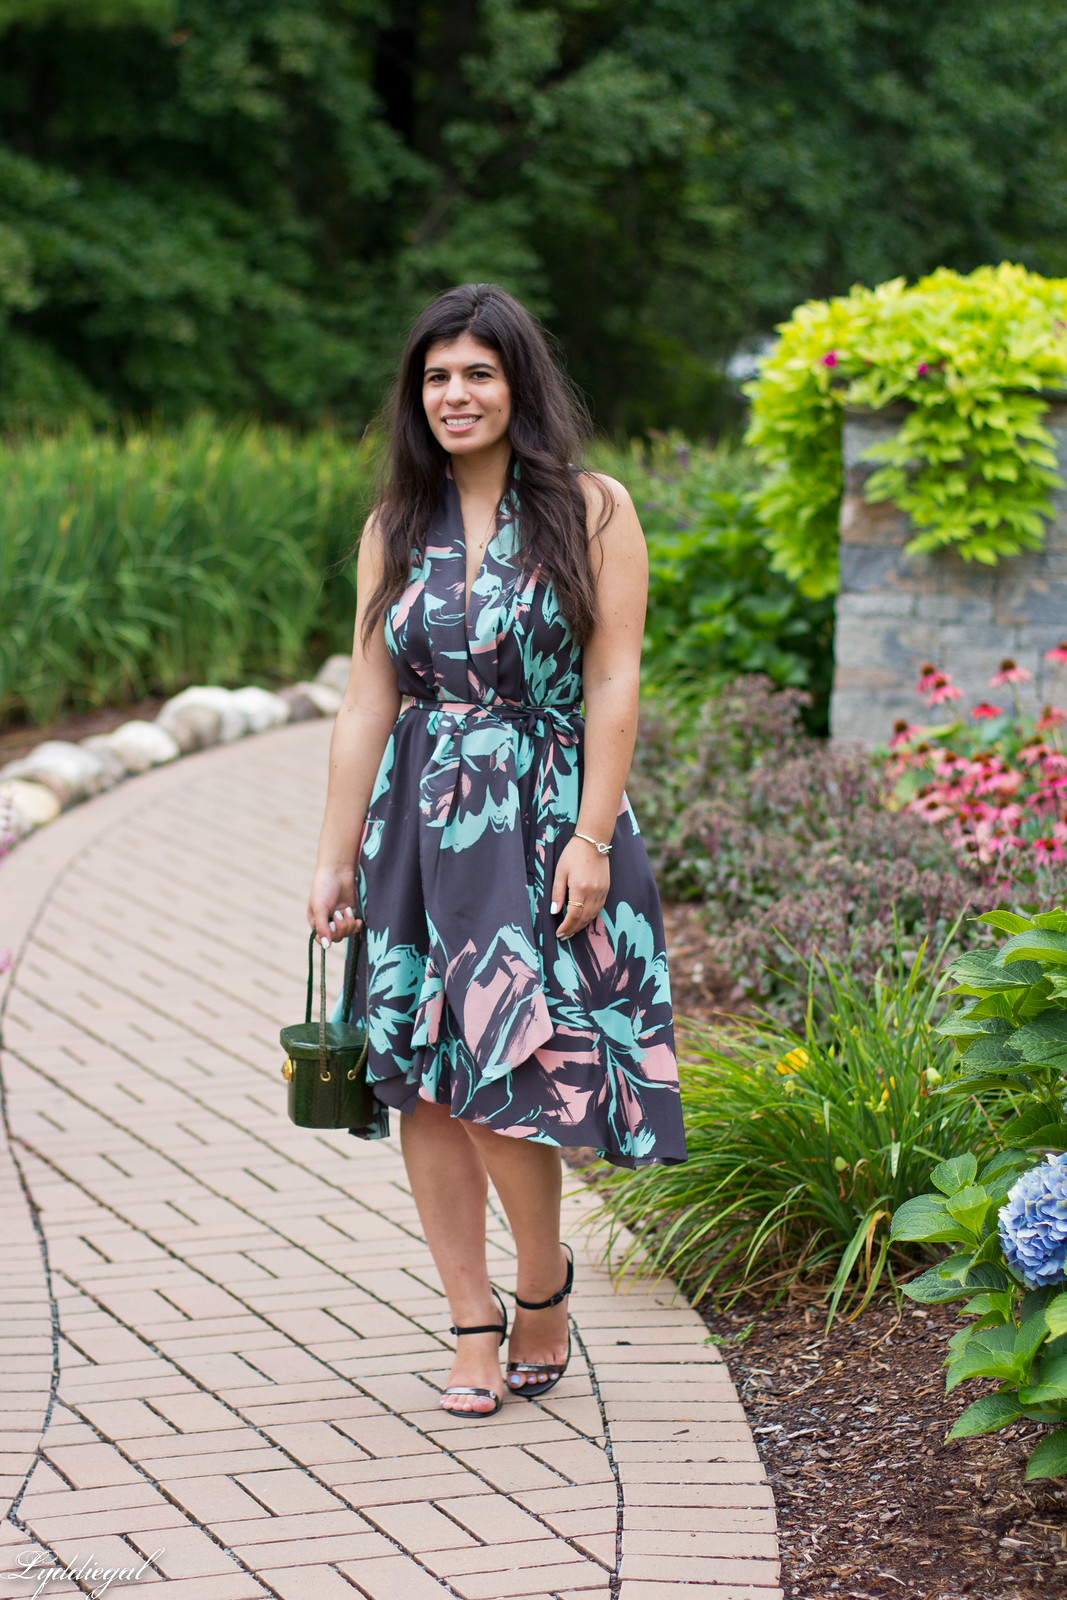 Silk floral print dress, vintage box handbag, black sandals-1.jpg